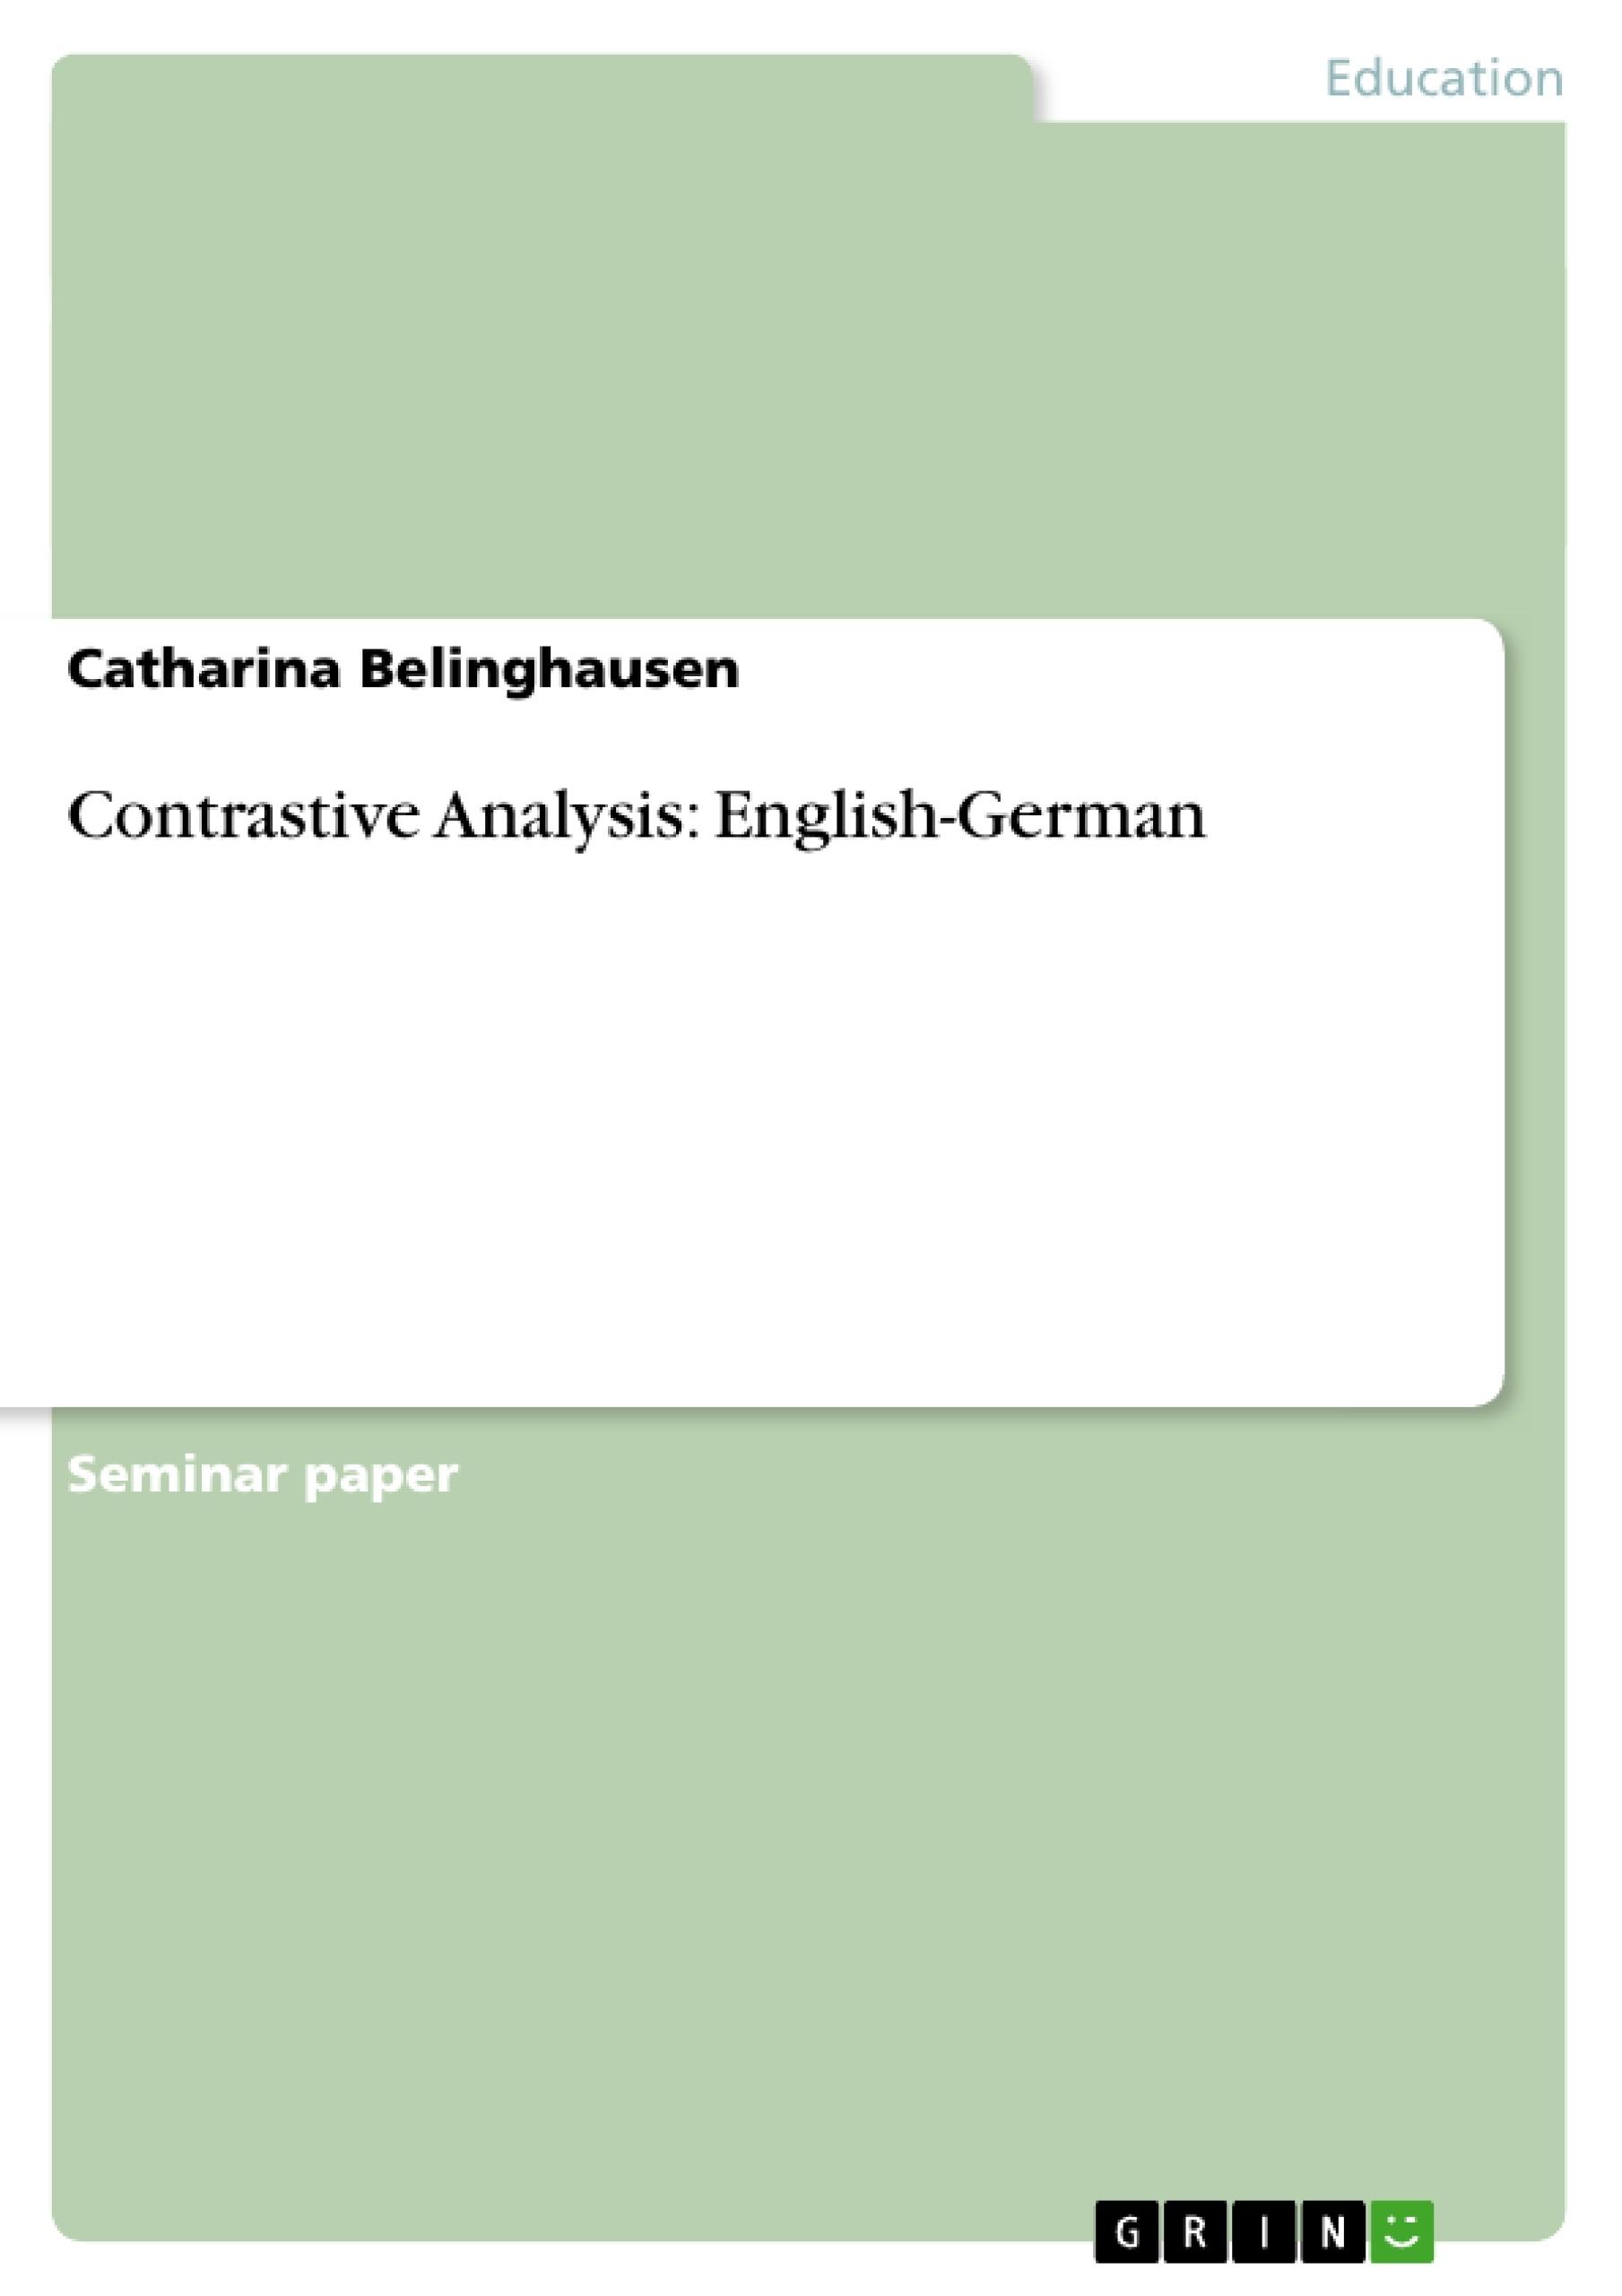 Title: Contrastive Analysis: English-German